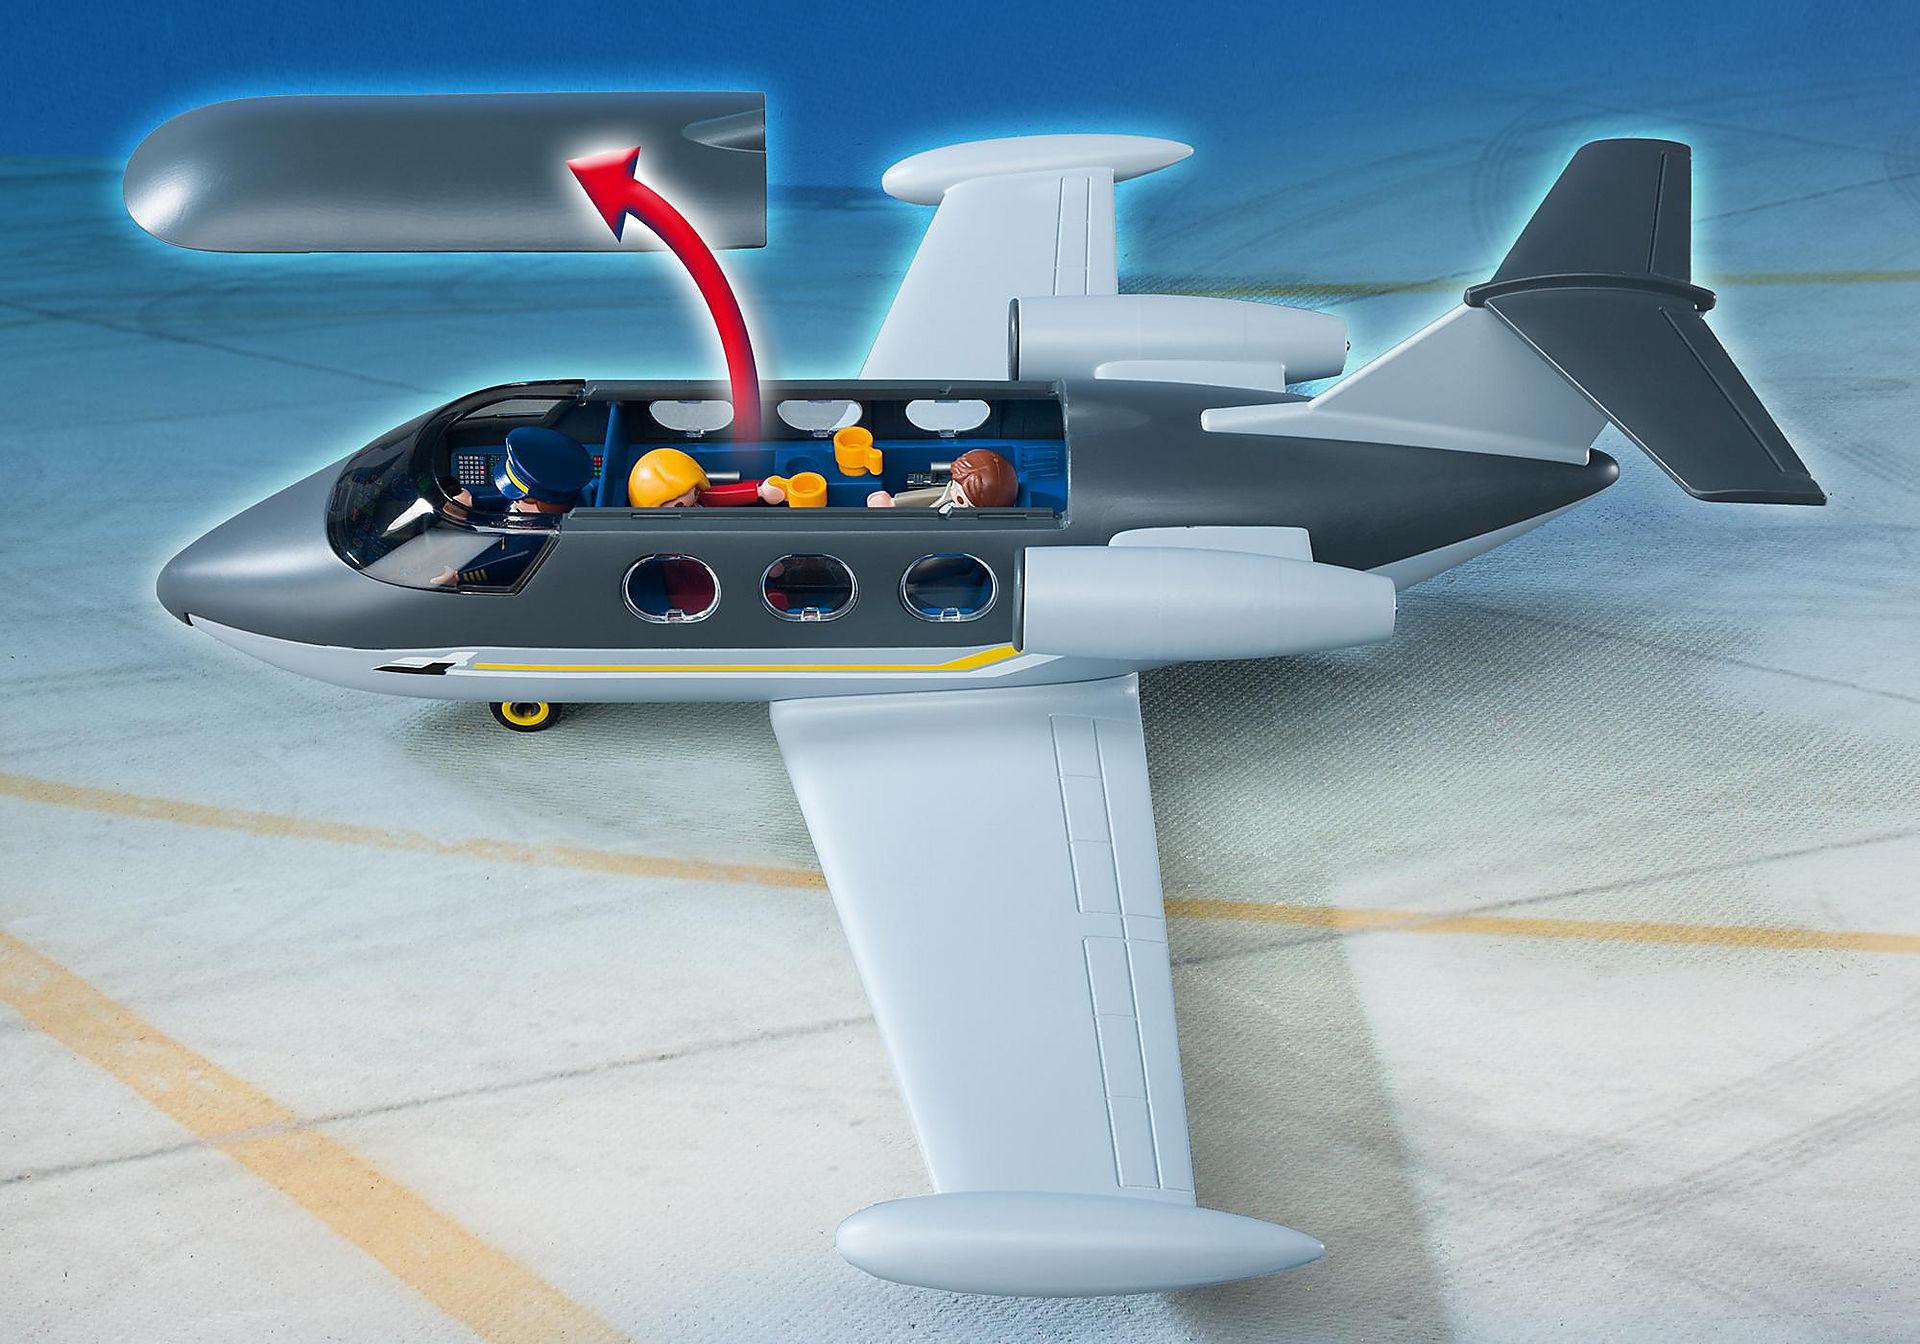 http://media.playmobil.com/i/playmobil/5619_product_extra1/Plane